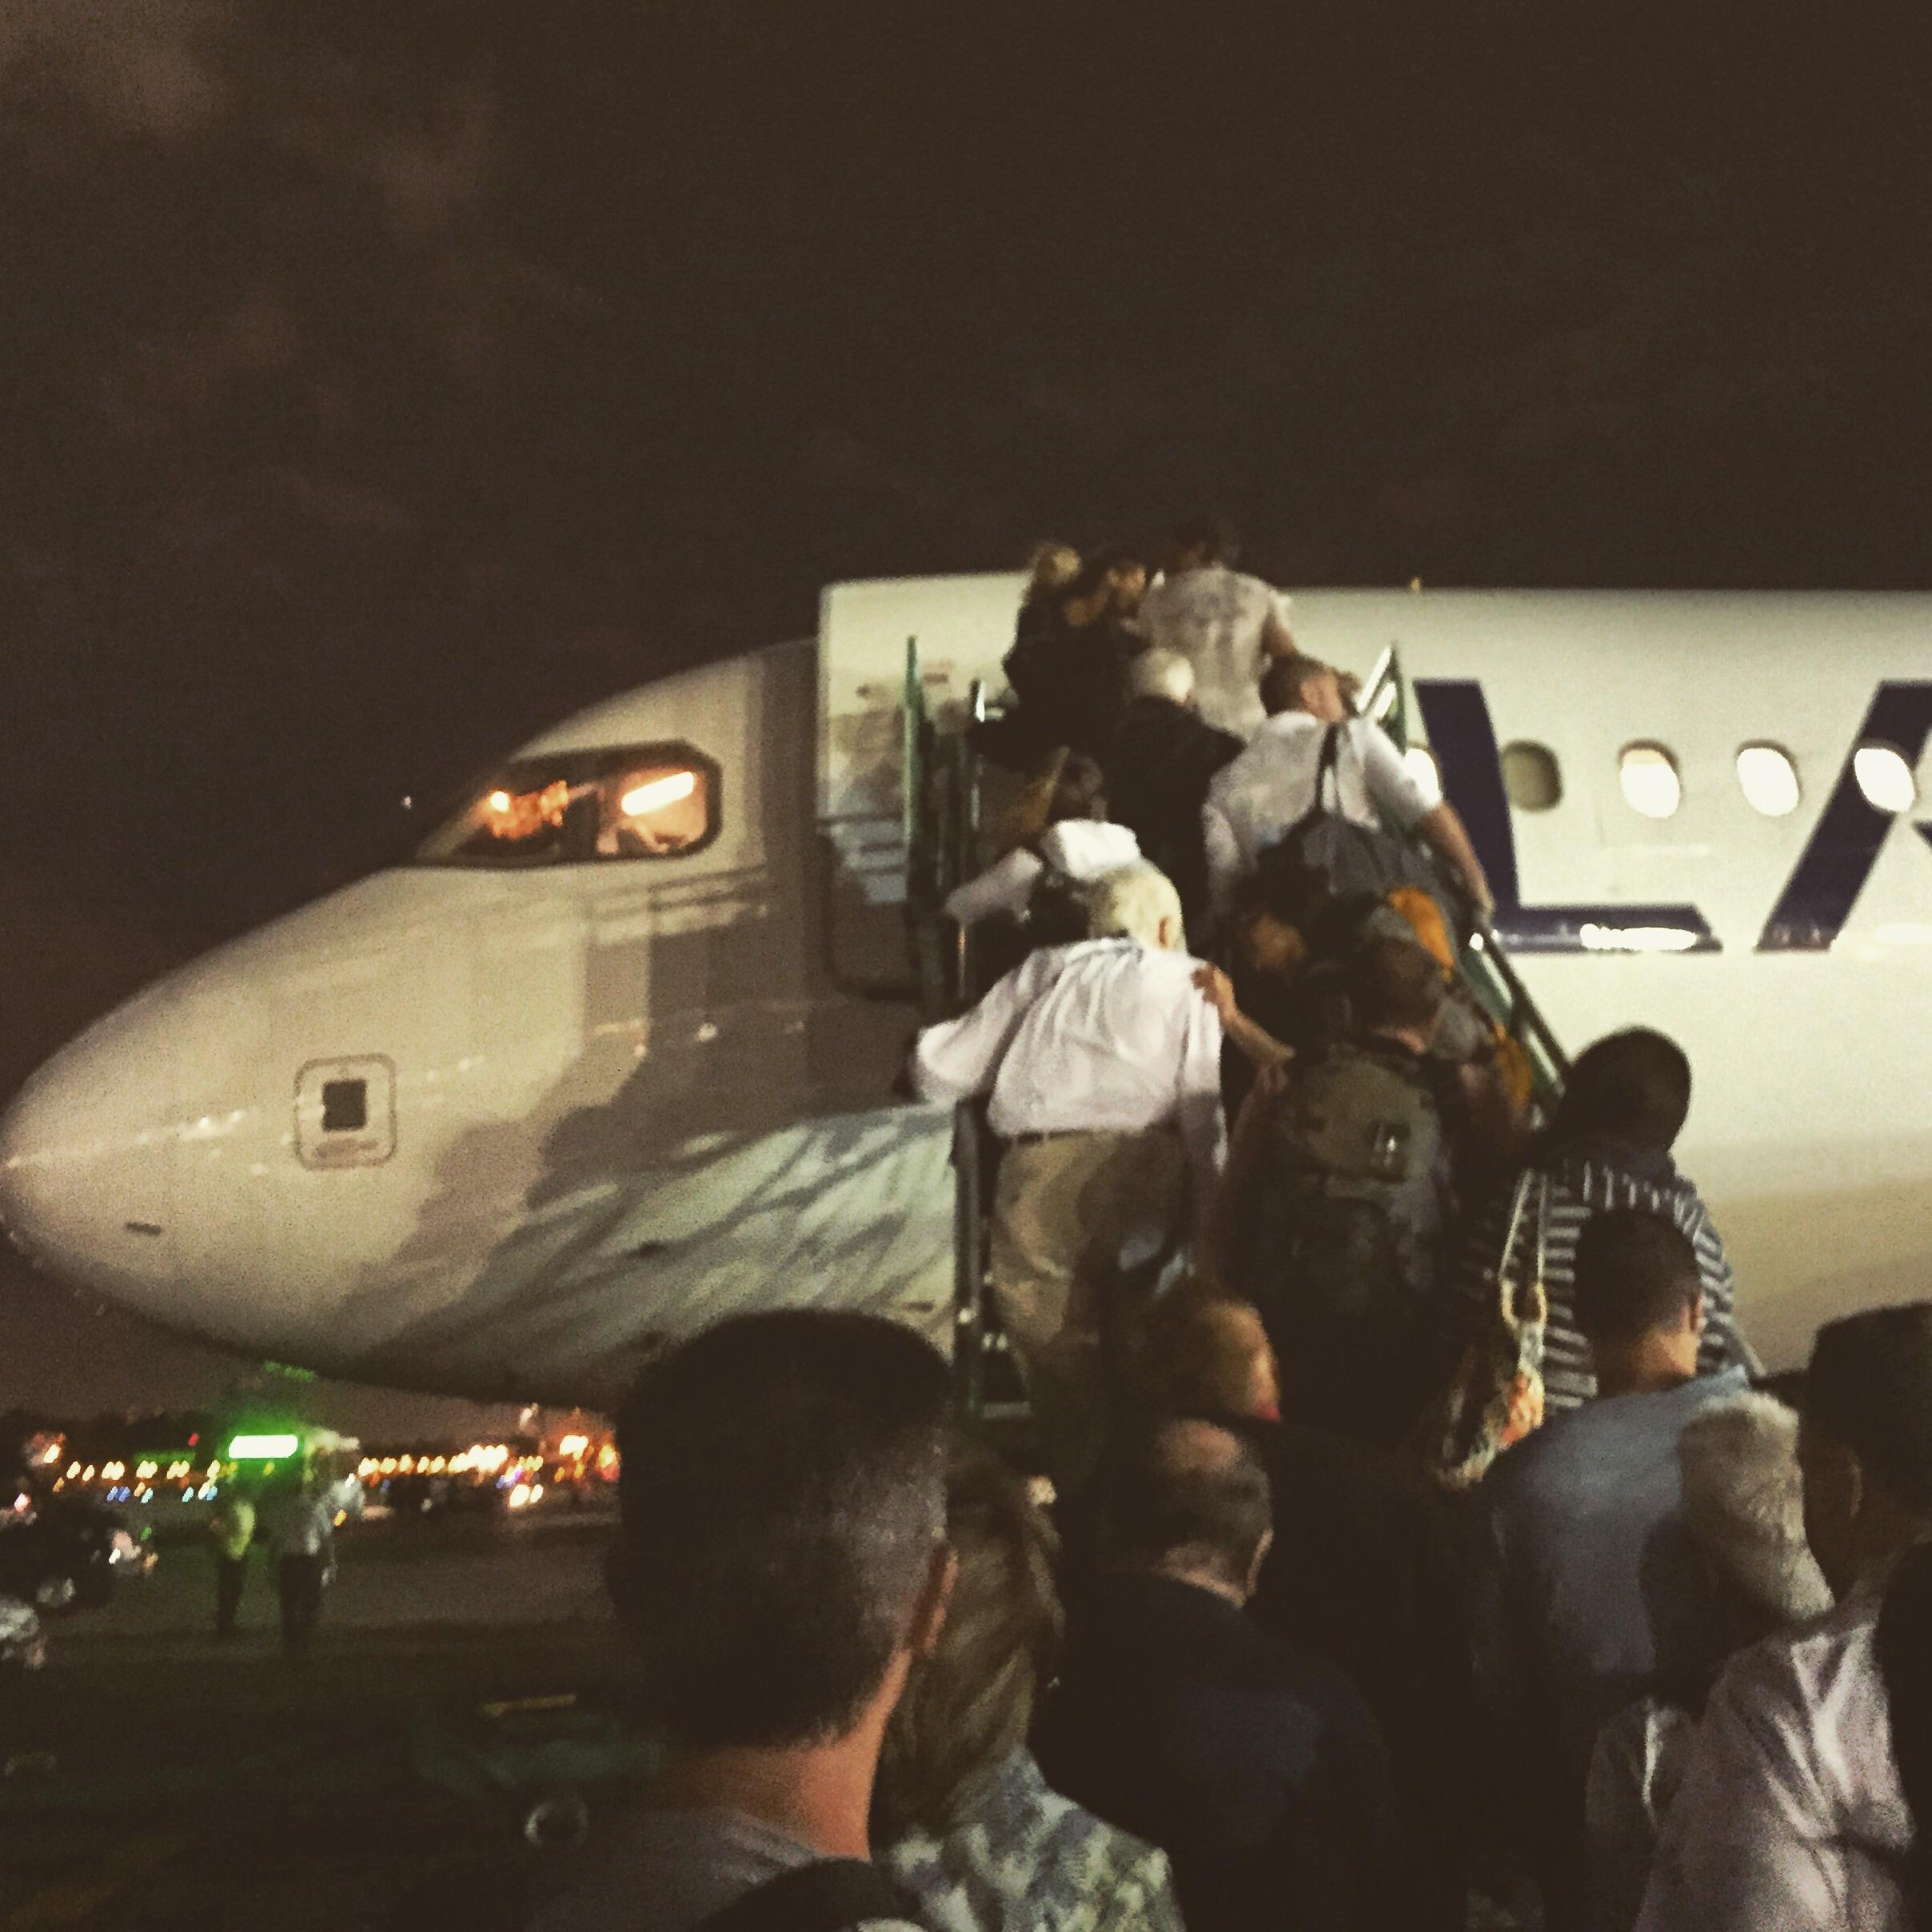 Boarding my flight bound for Bariloche.